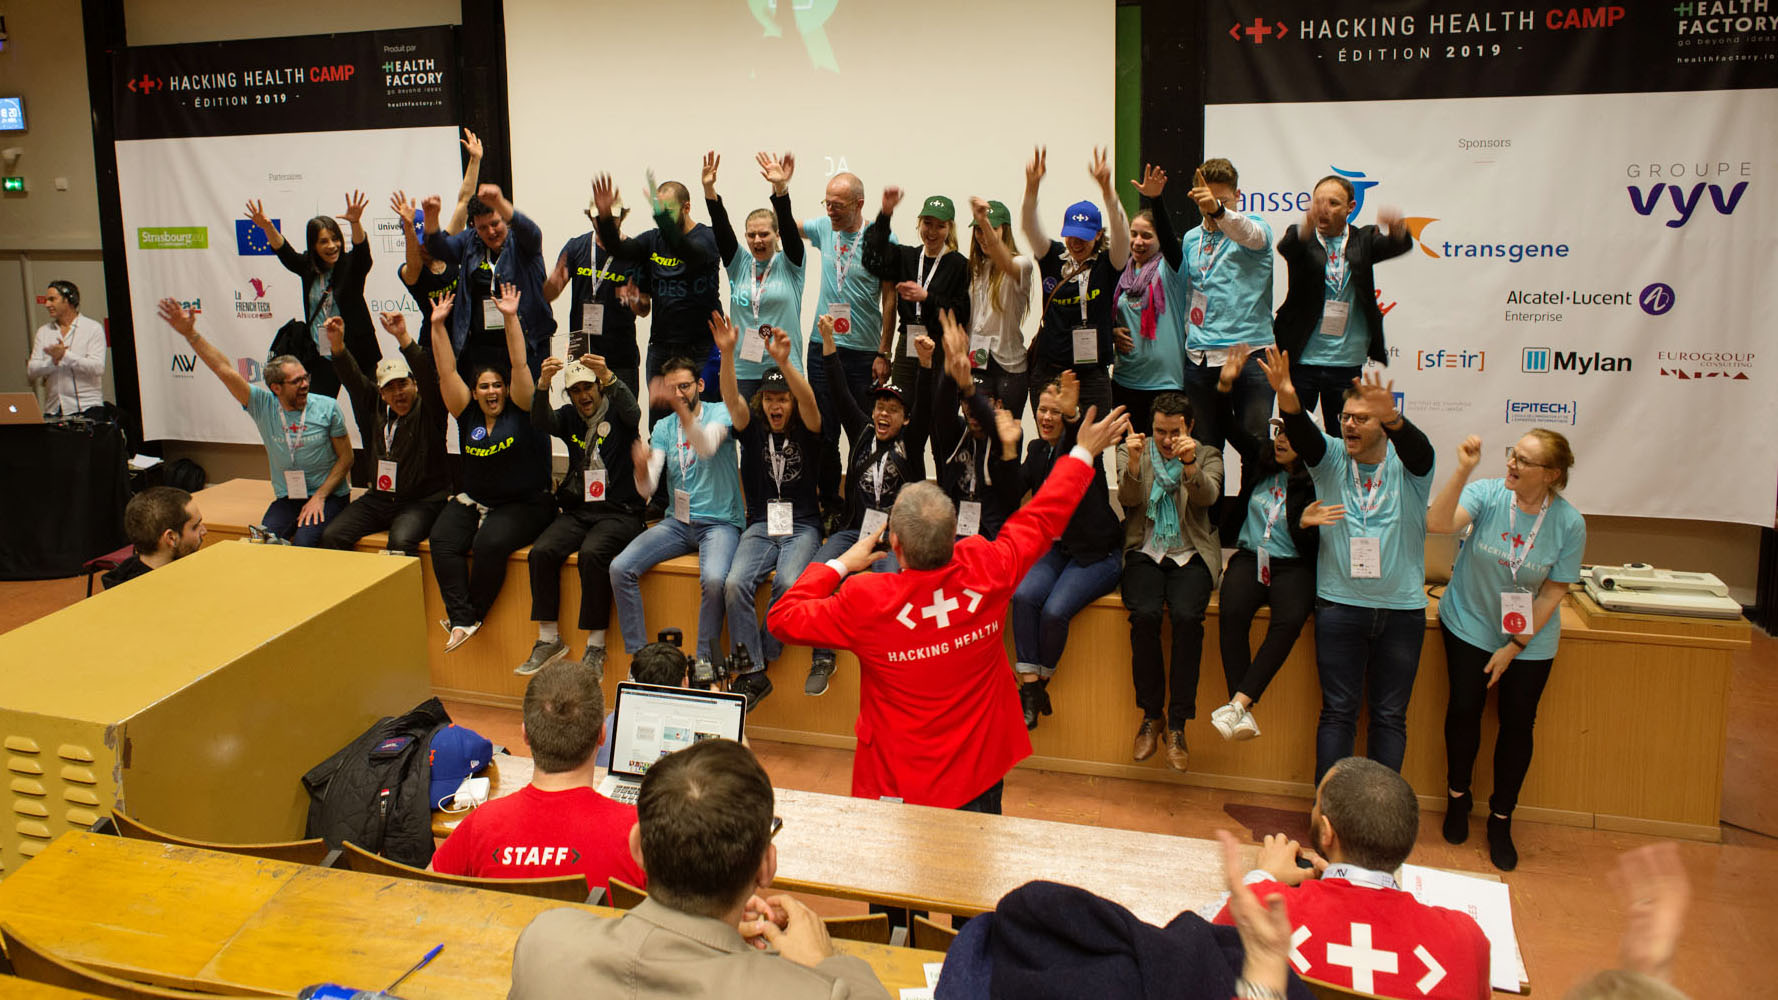 hacking-health-camp-sfeir3